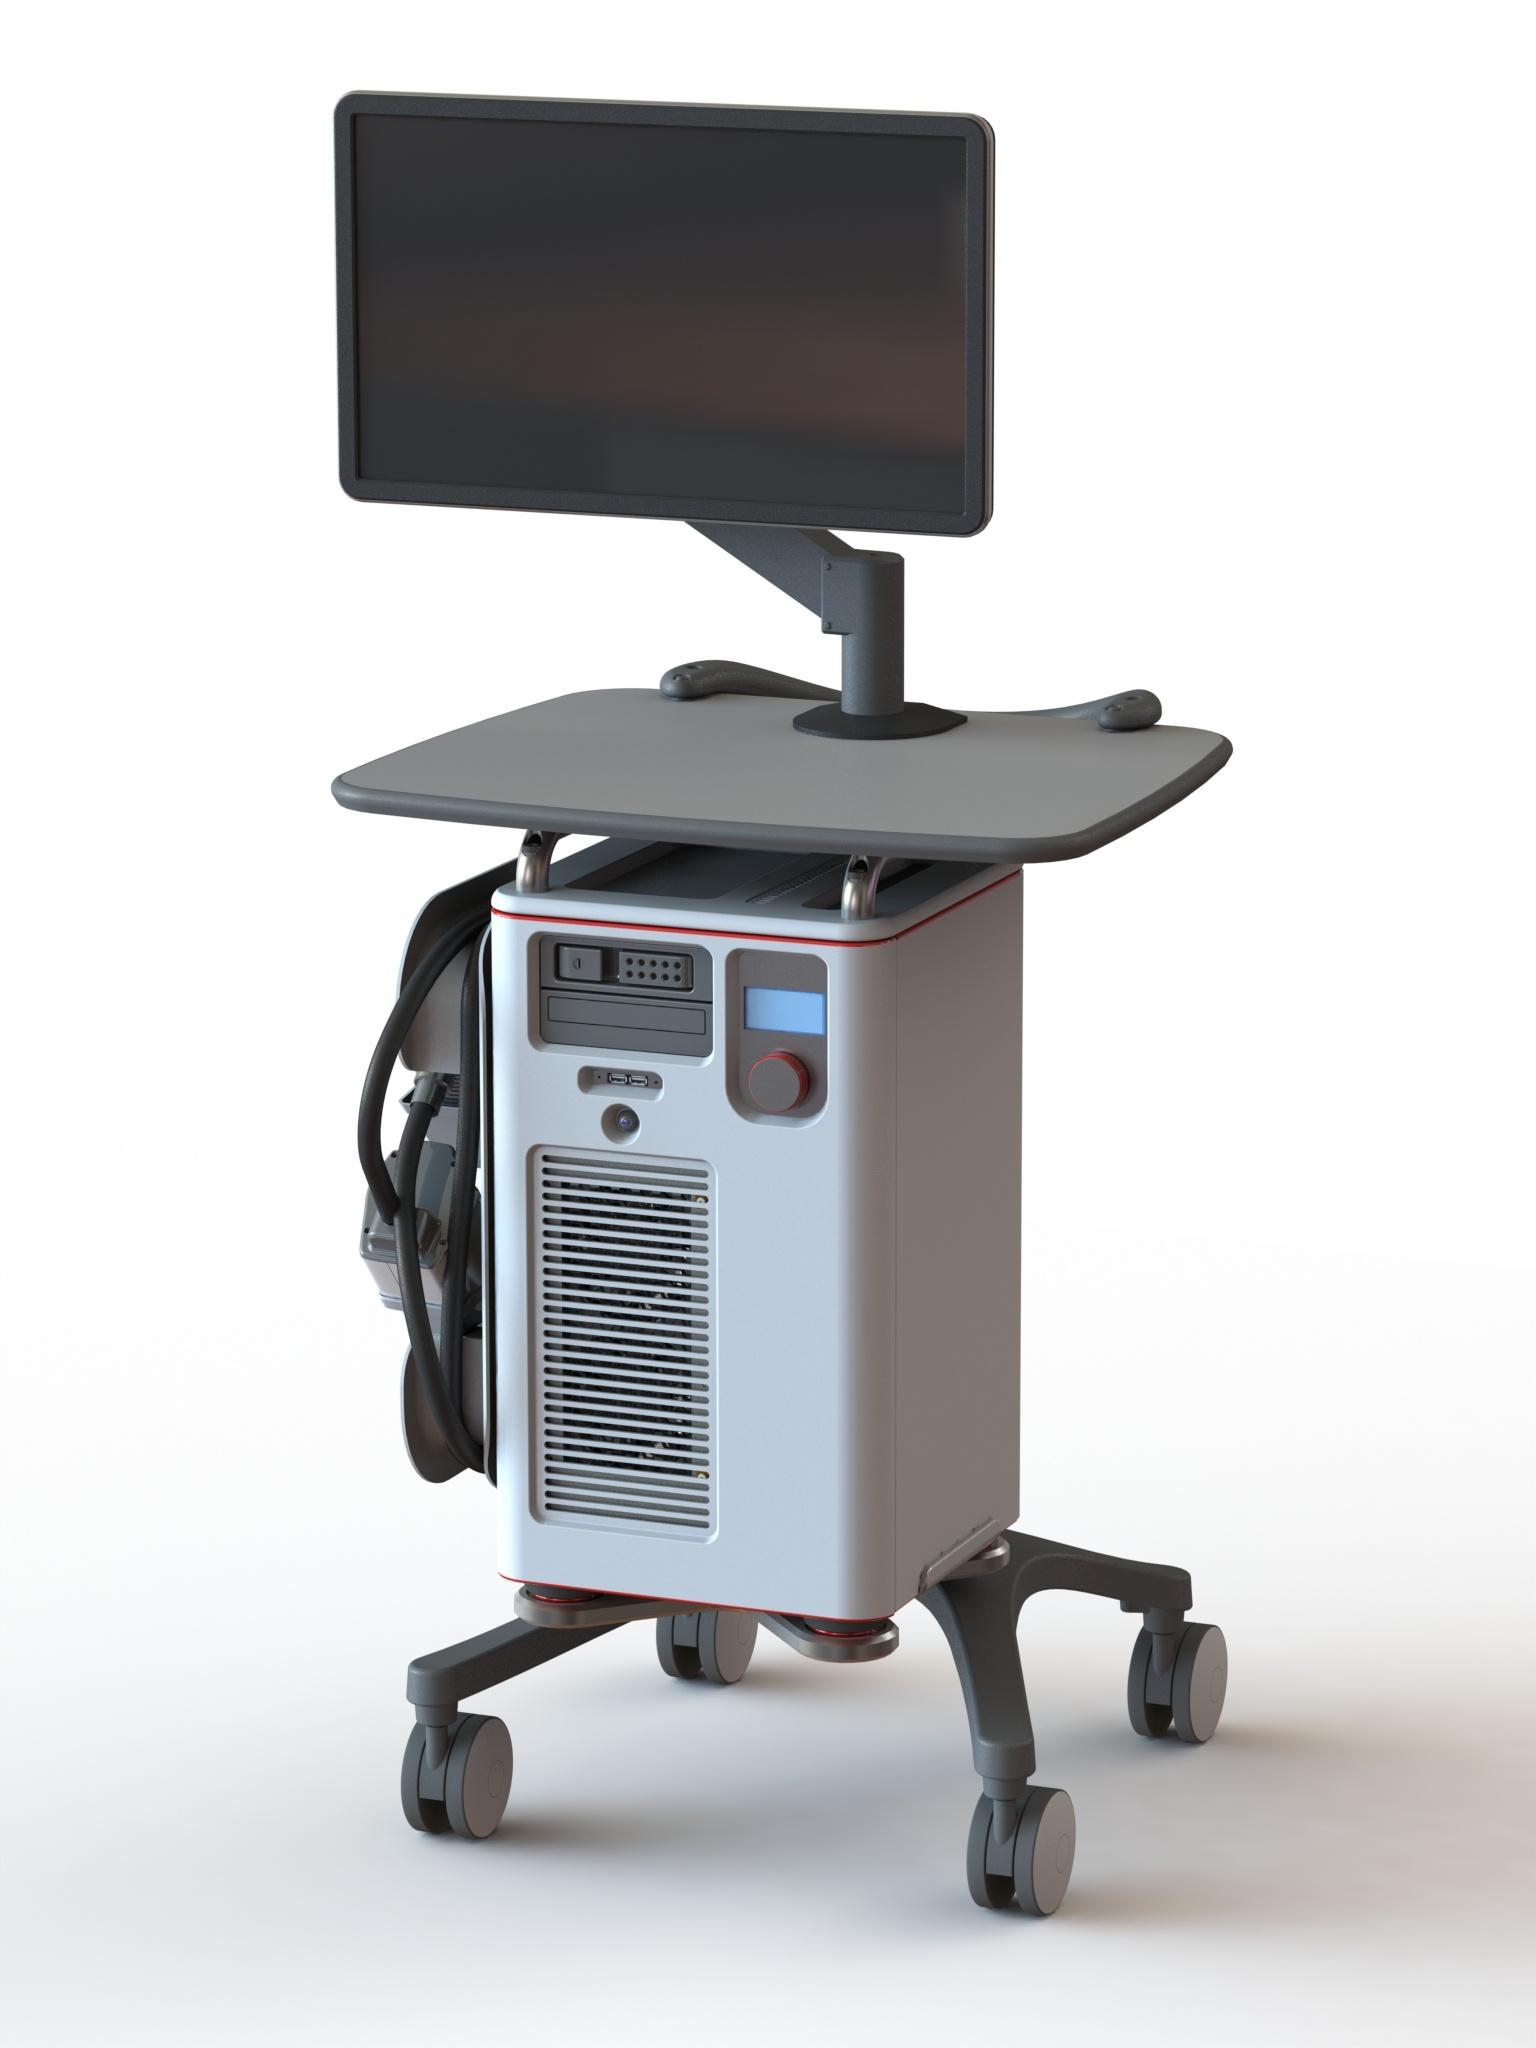 Bioptigen Envisu Image System